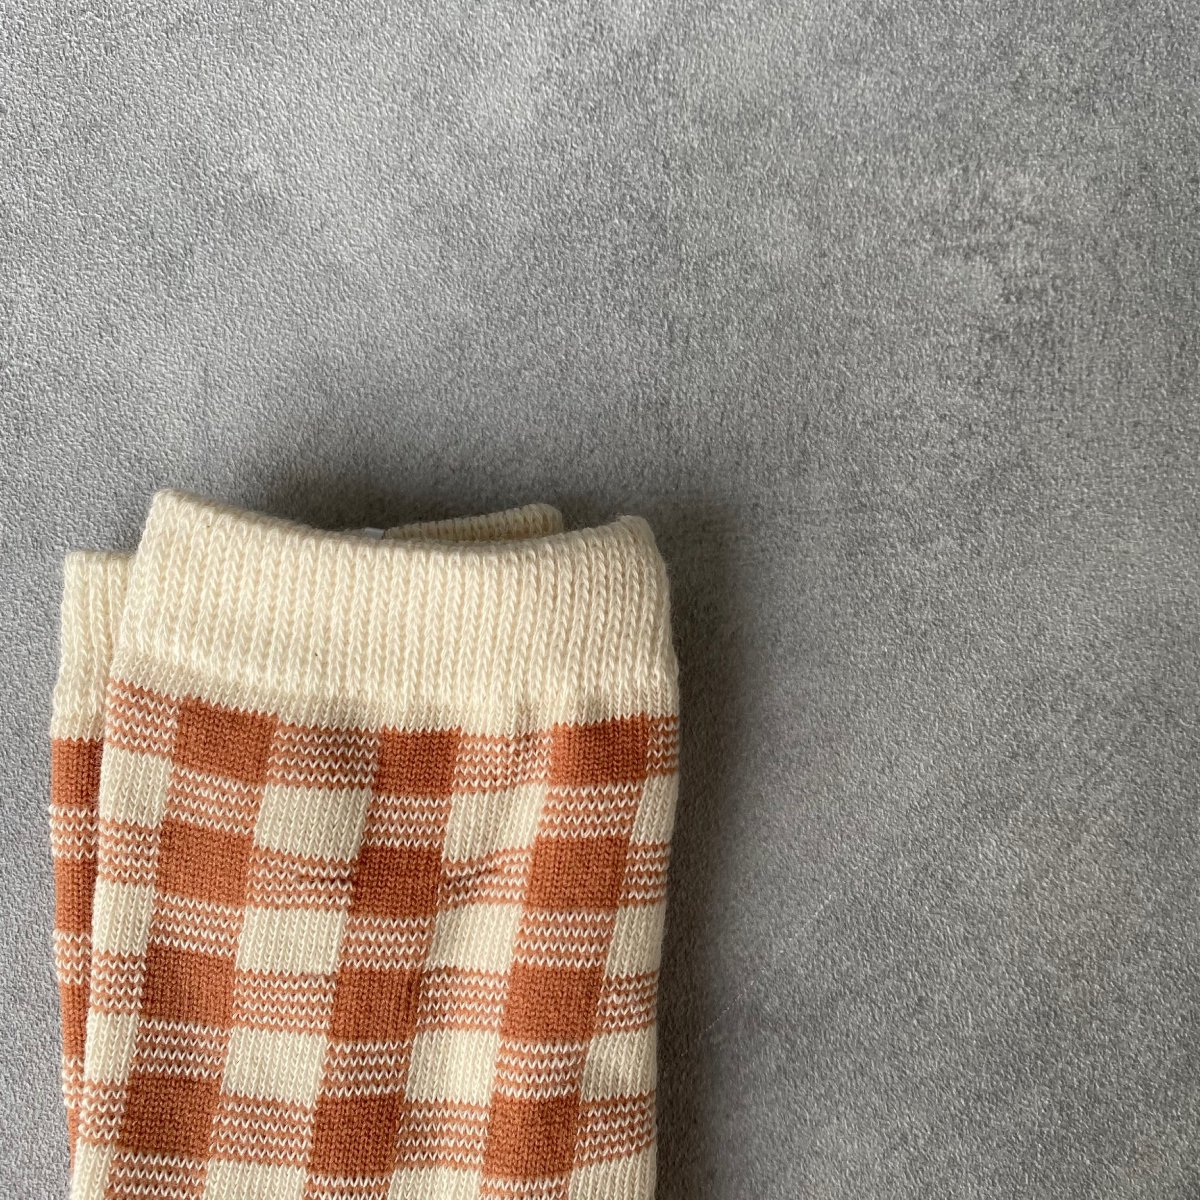 【KIDS】Natural Check Socks 詳細画像14